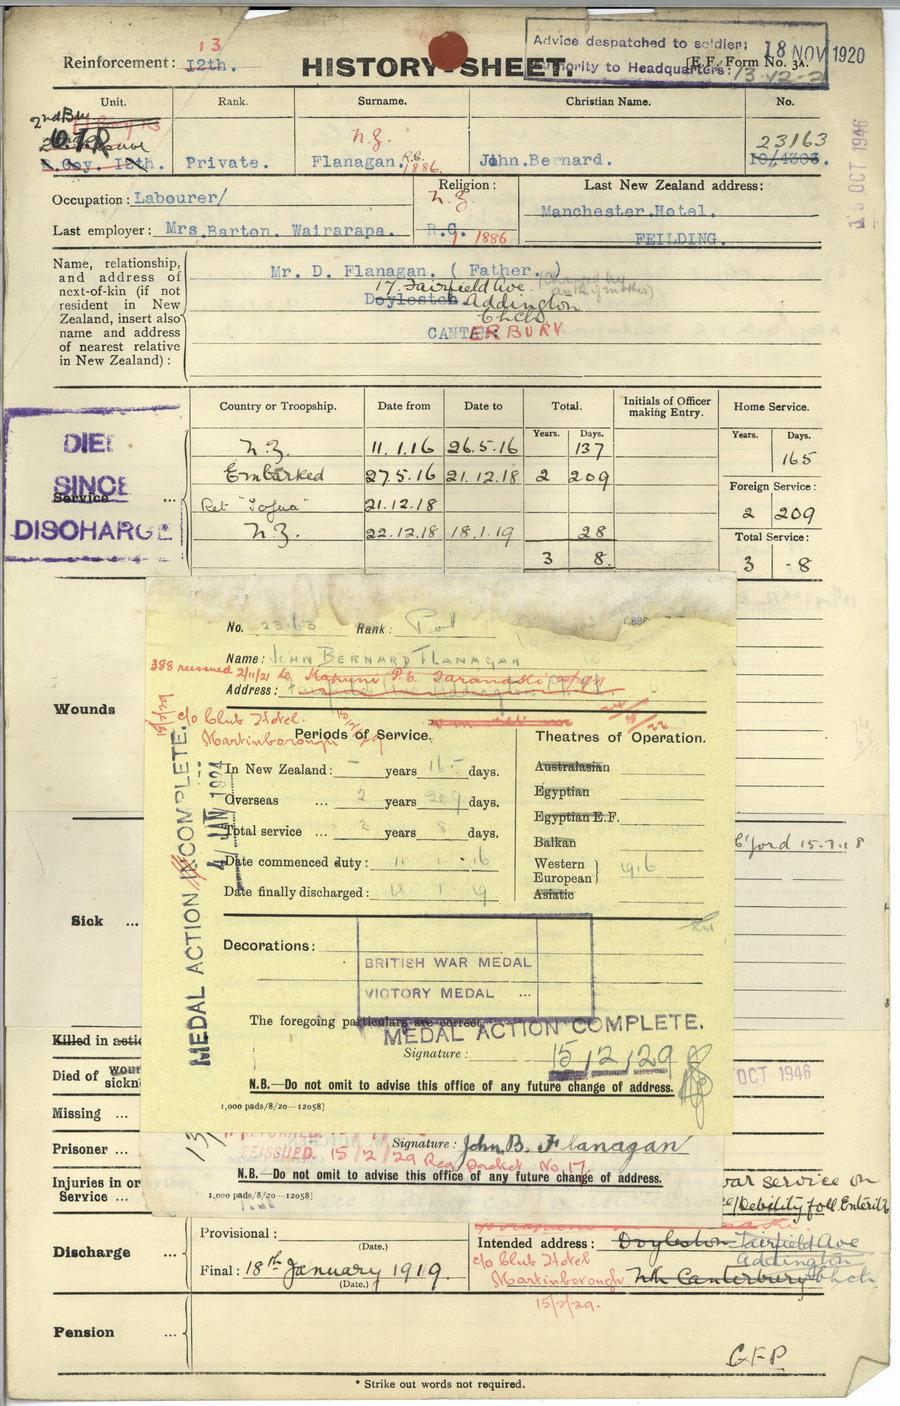 FLANAGAN, John Bernard - WW1 23163 - Army